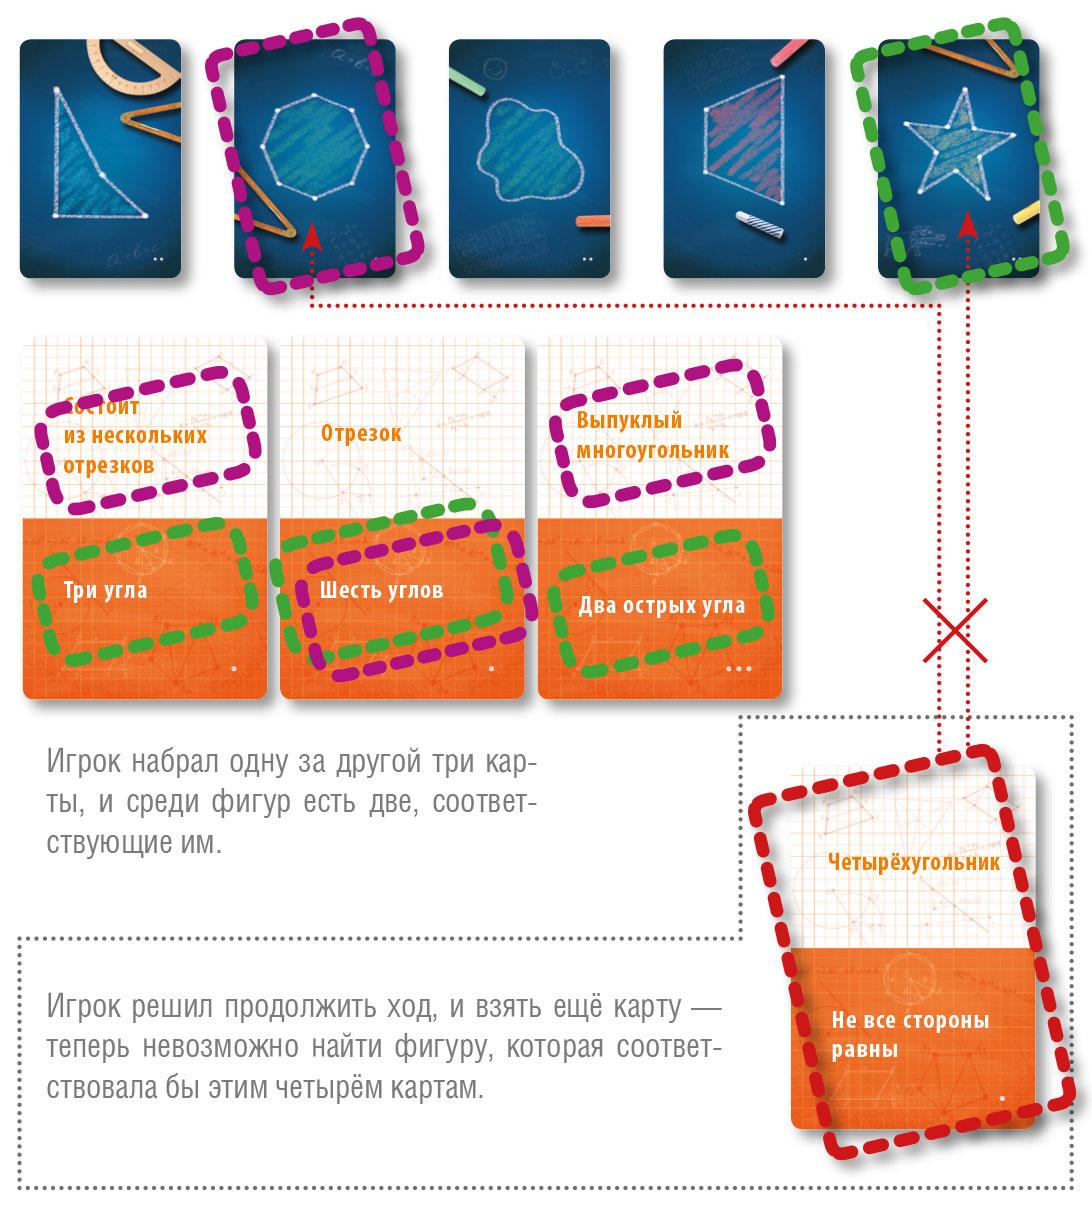 игра Геометрика — правила